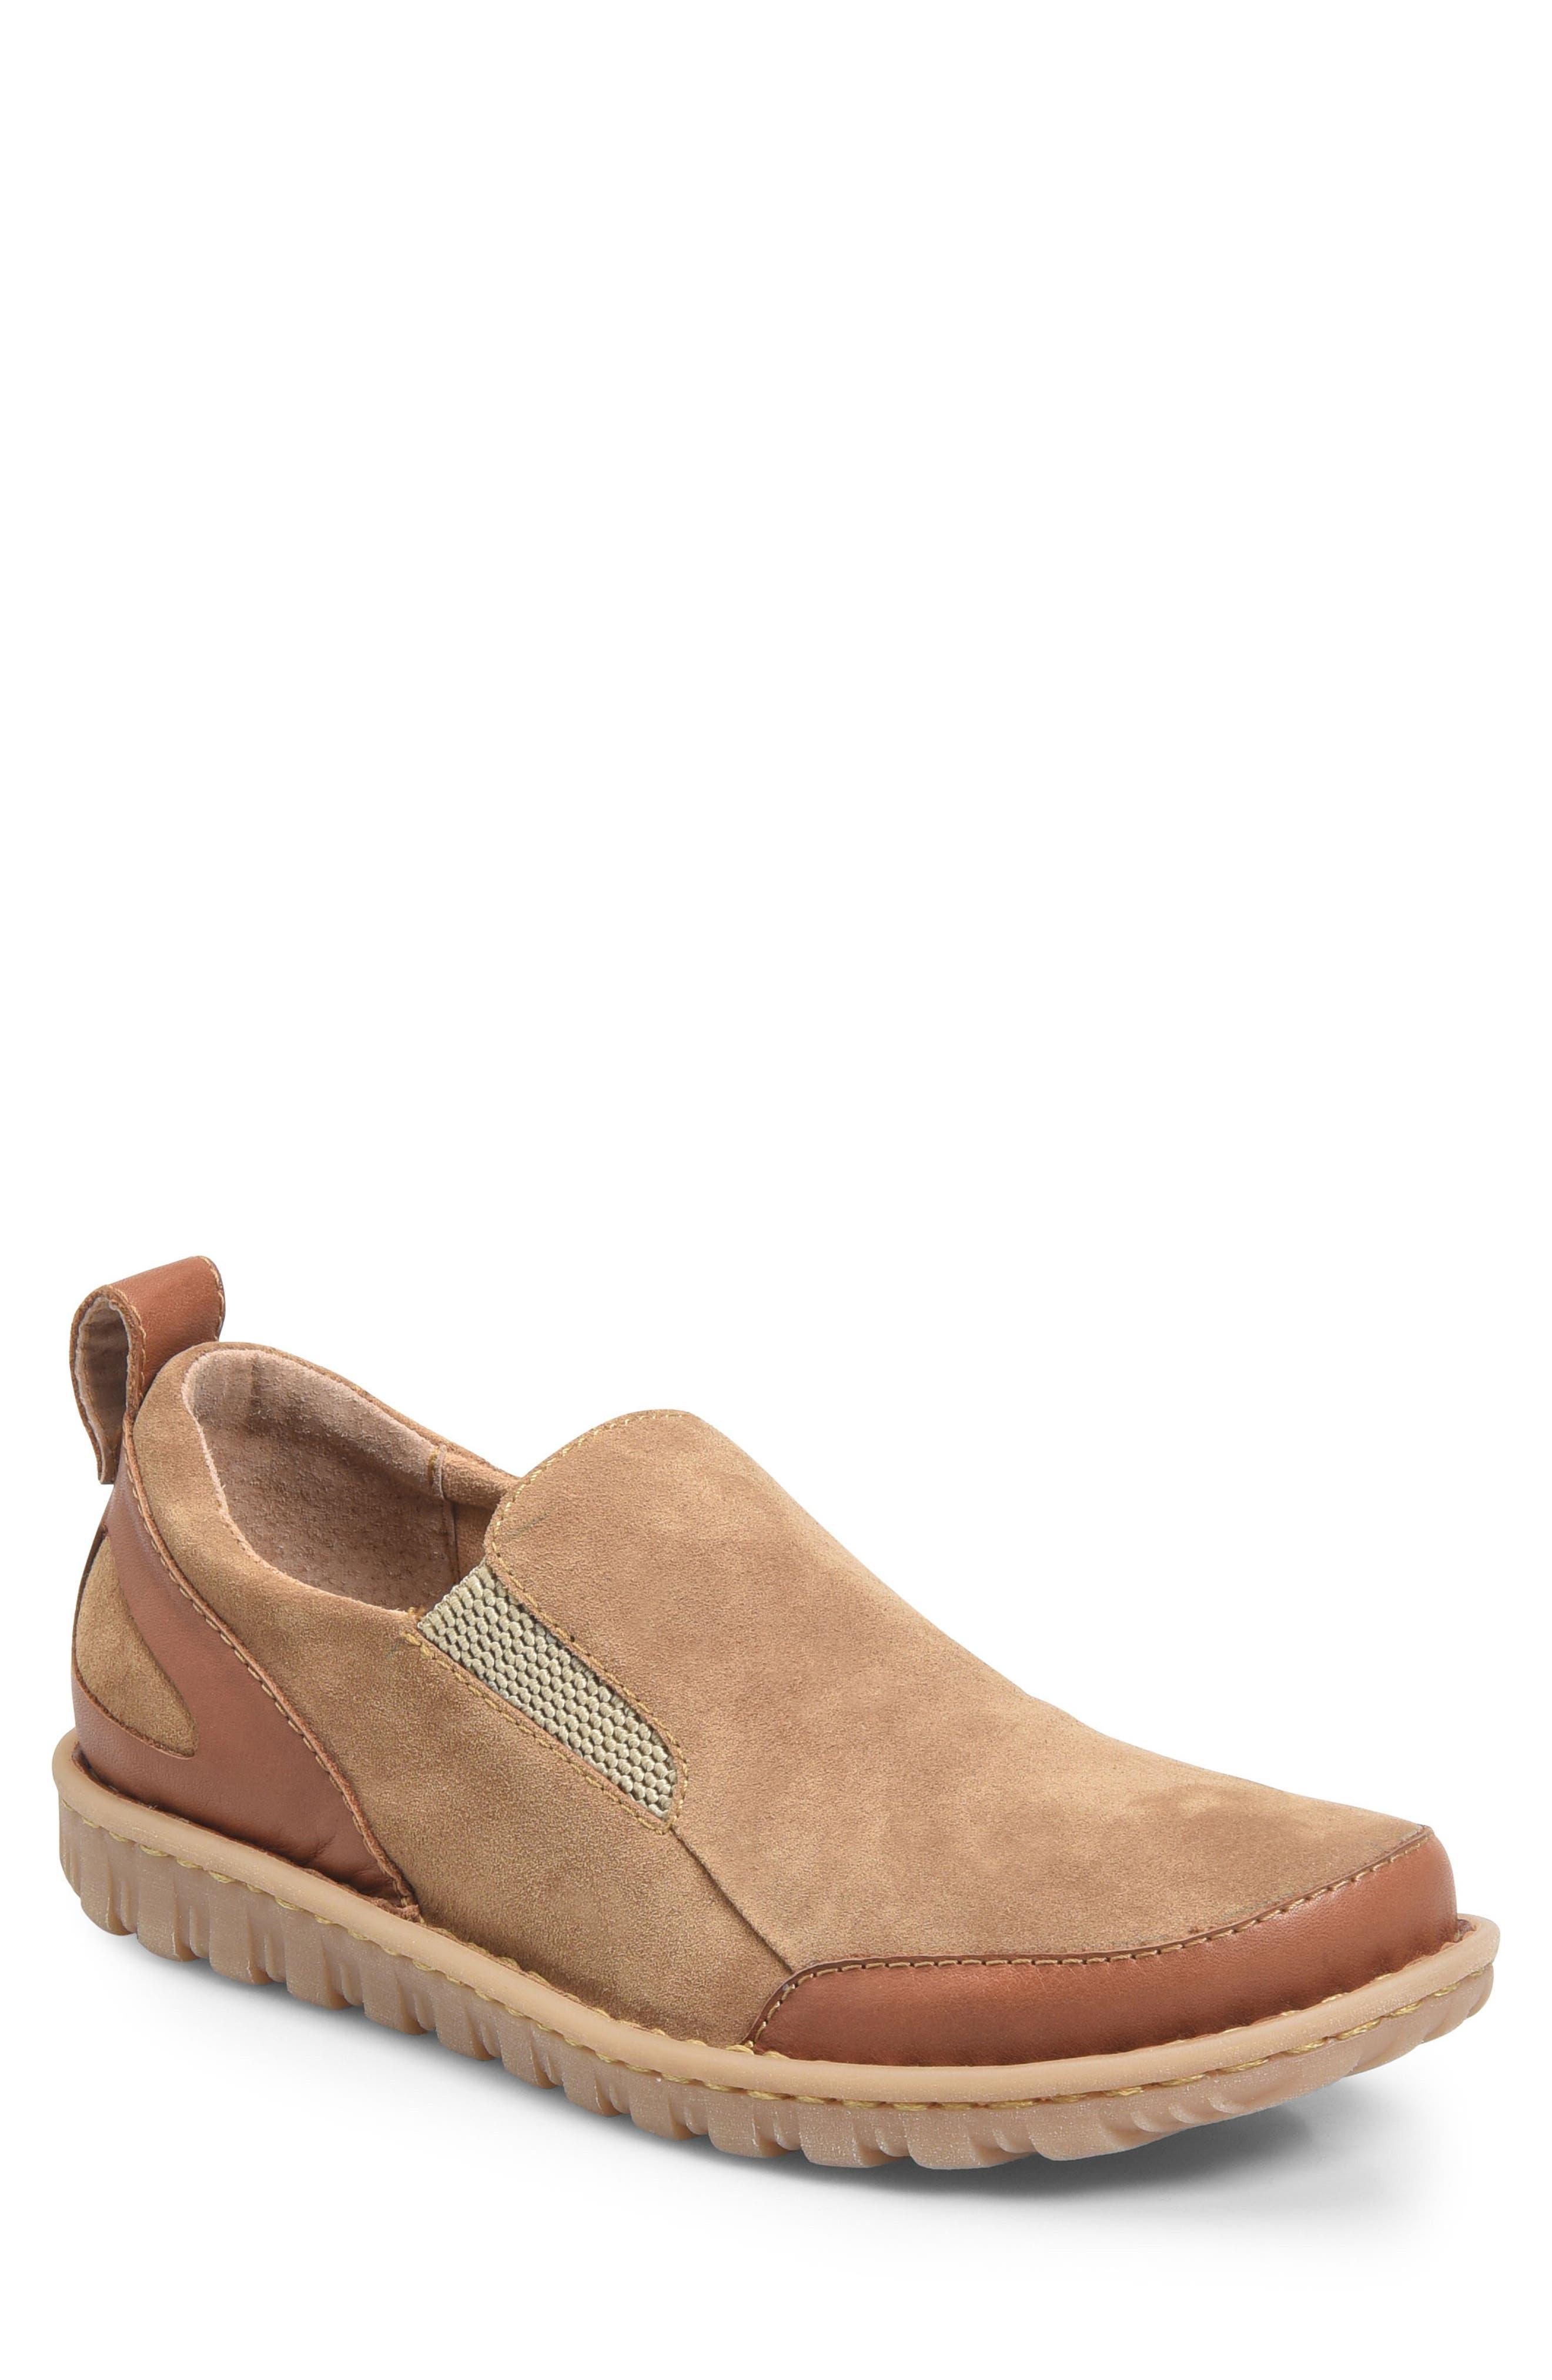 Pepper Slip-On,                         Main,                         color, Light Brown Leather